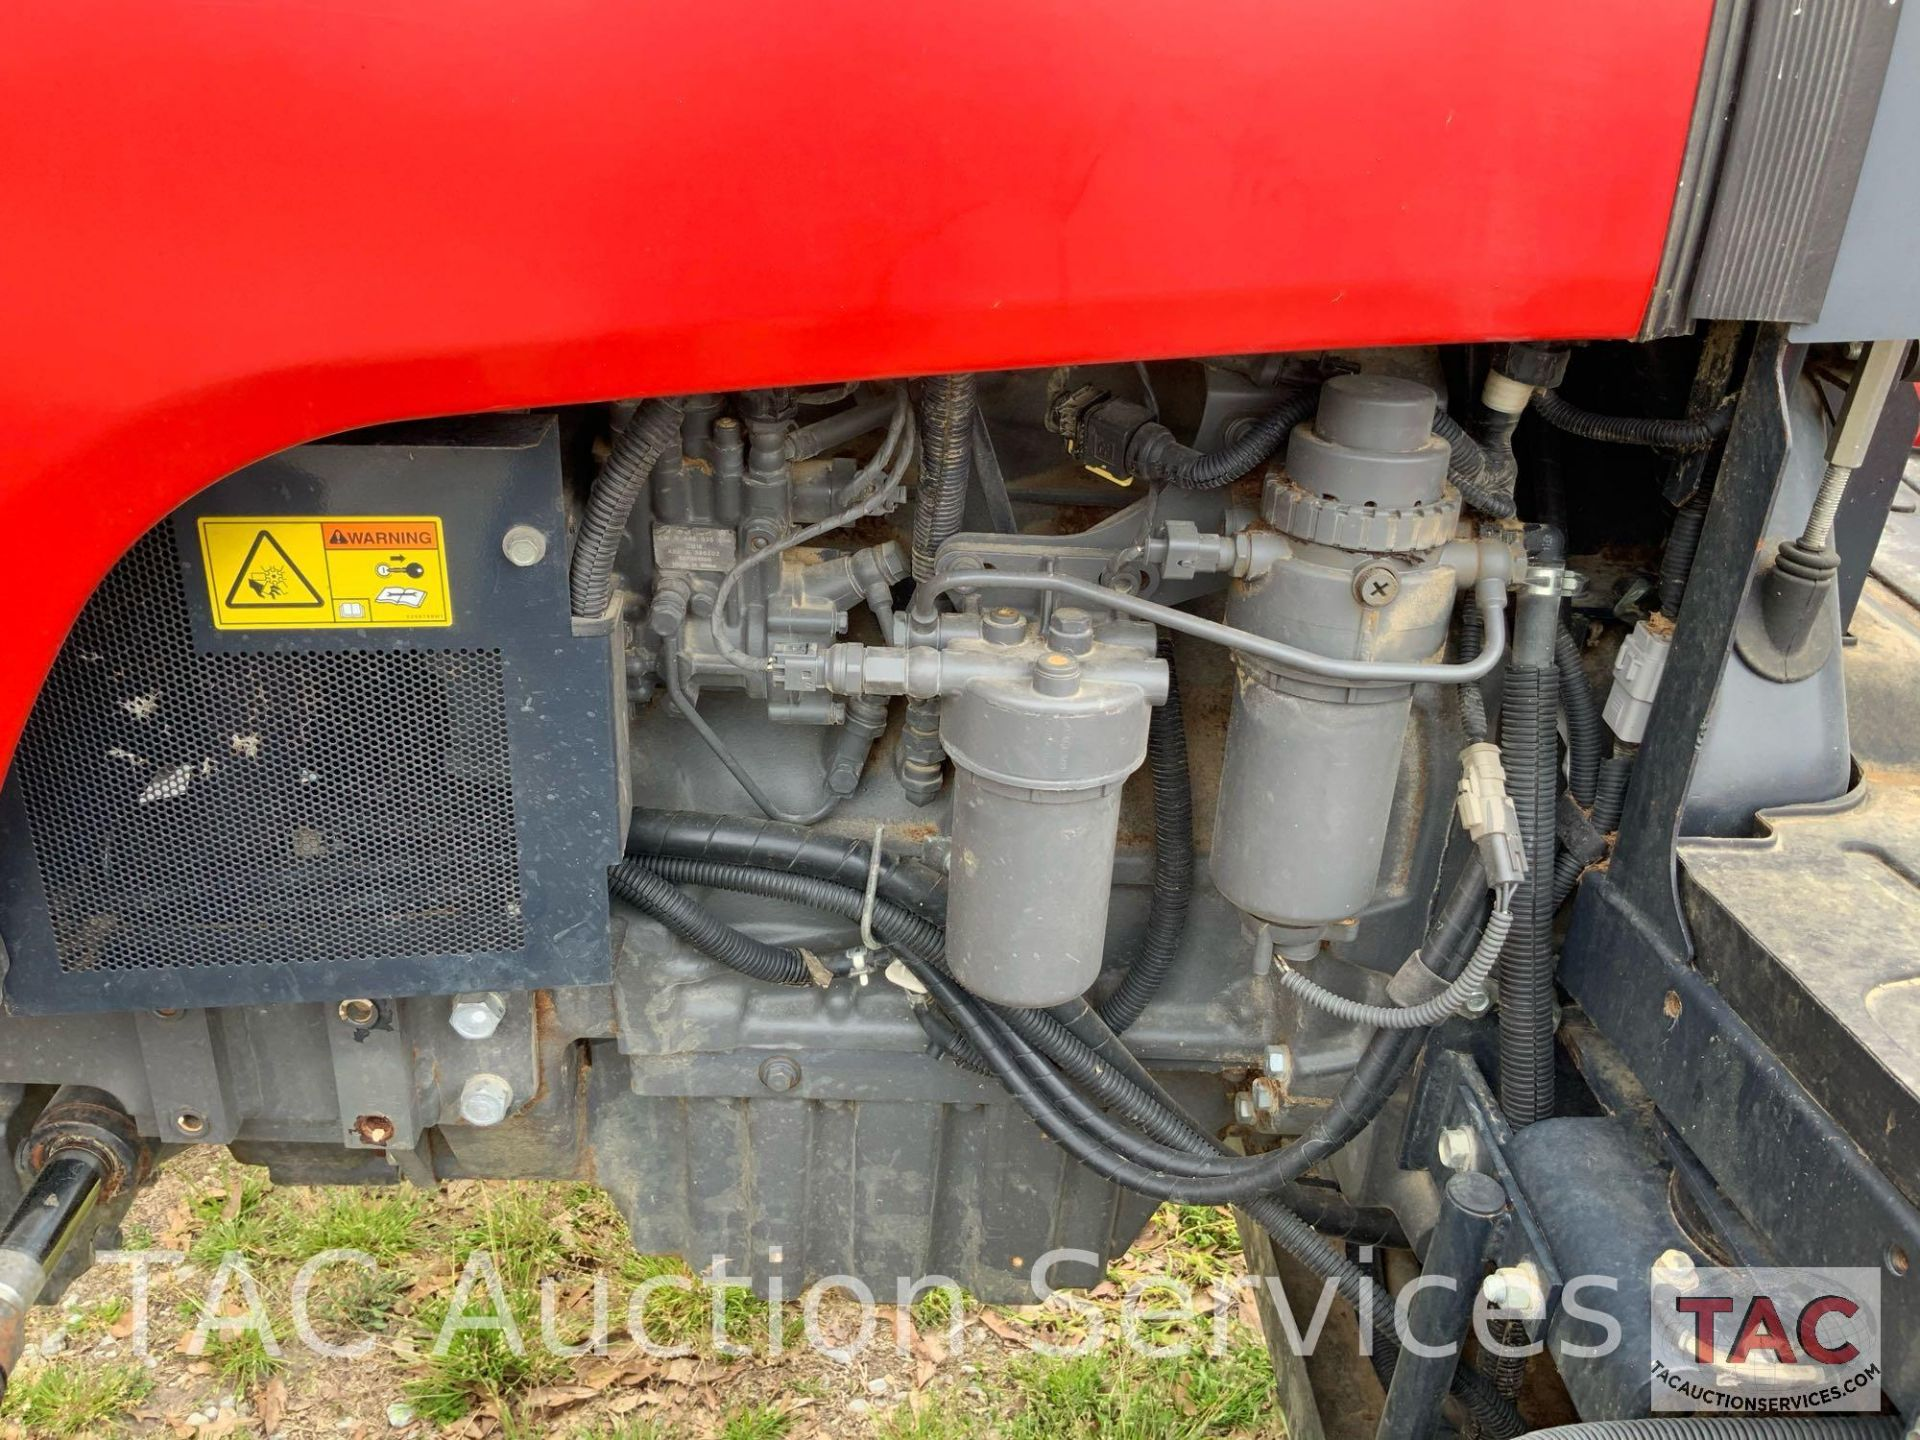 Massey-Ferguson 4610LP Farm Tractor - Image 18 of 26